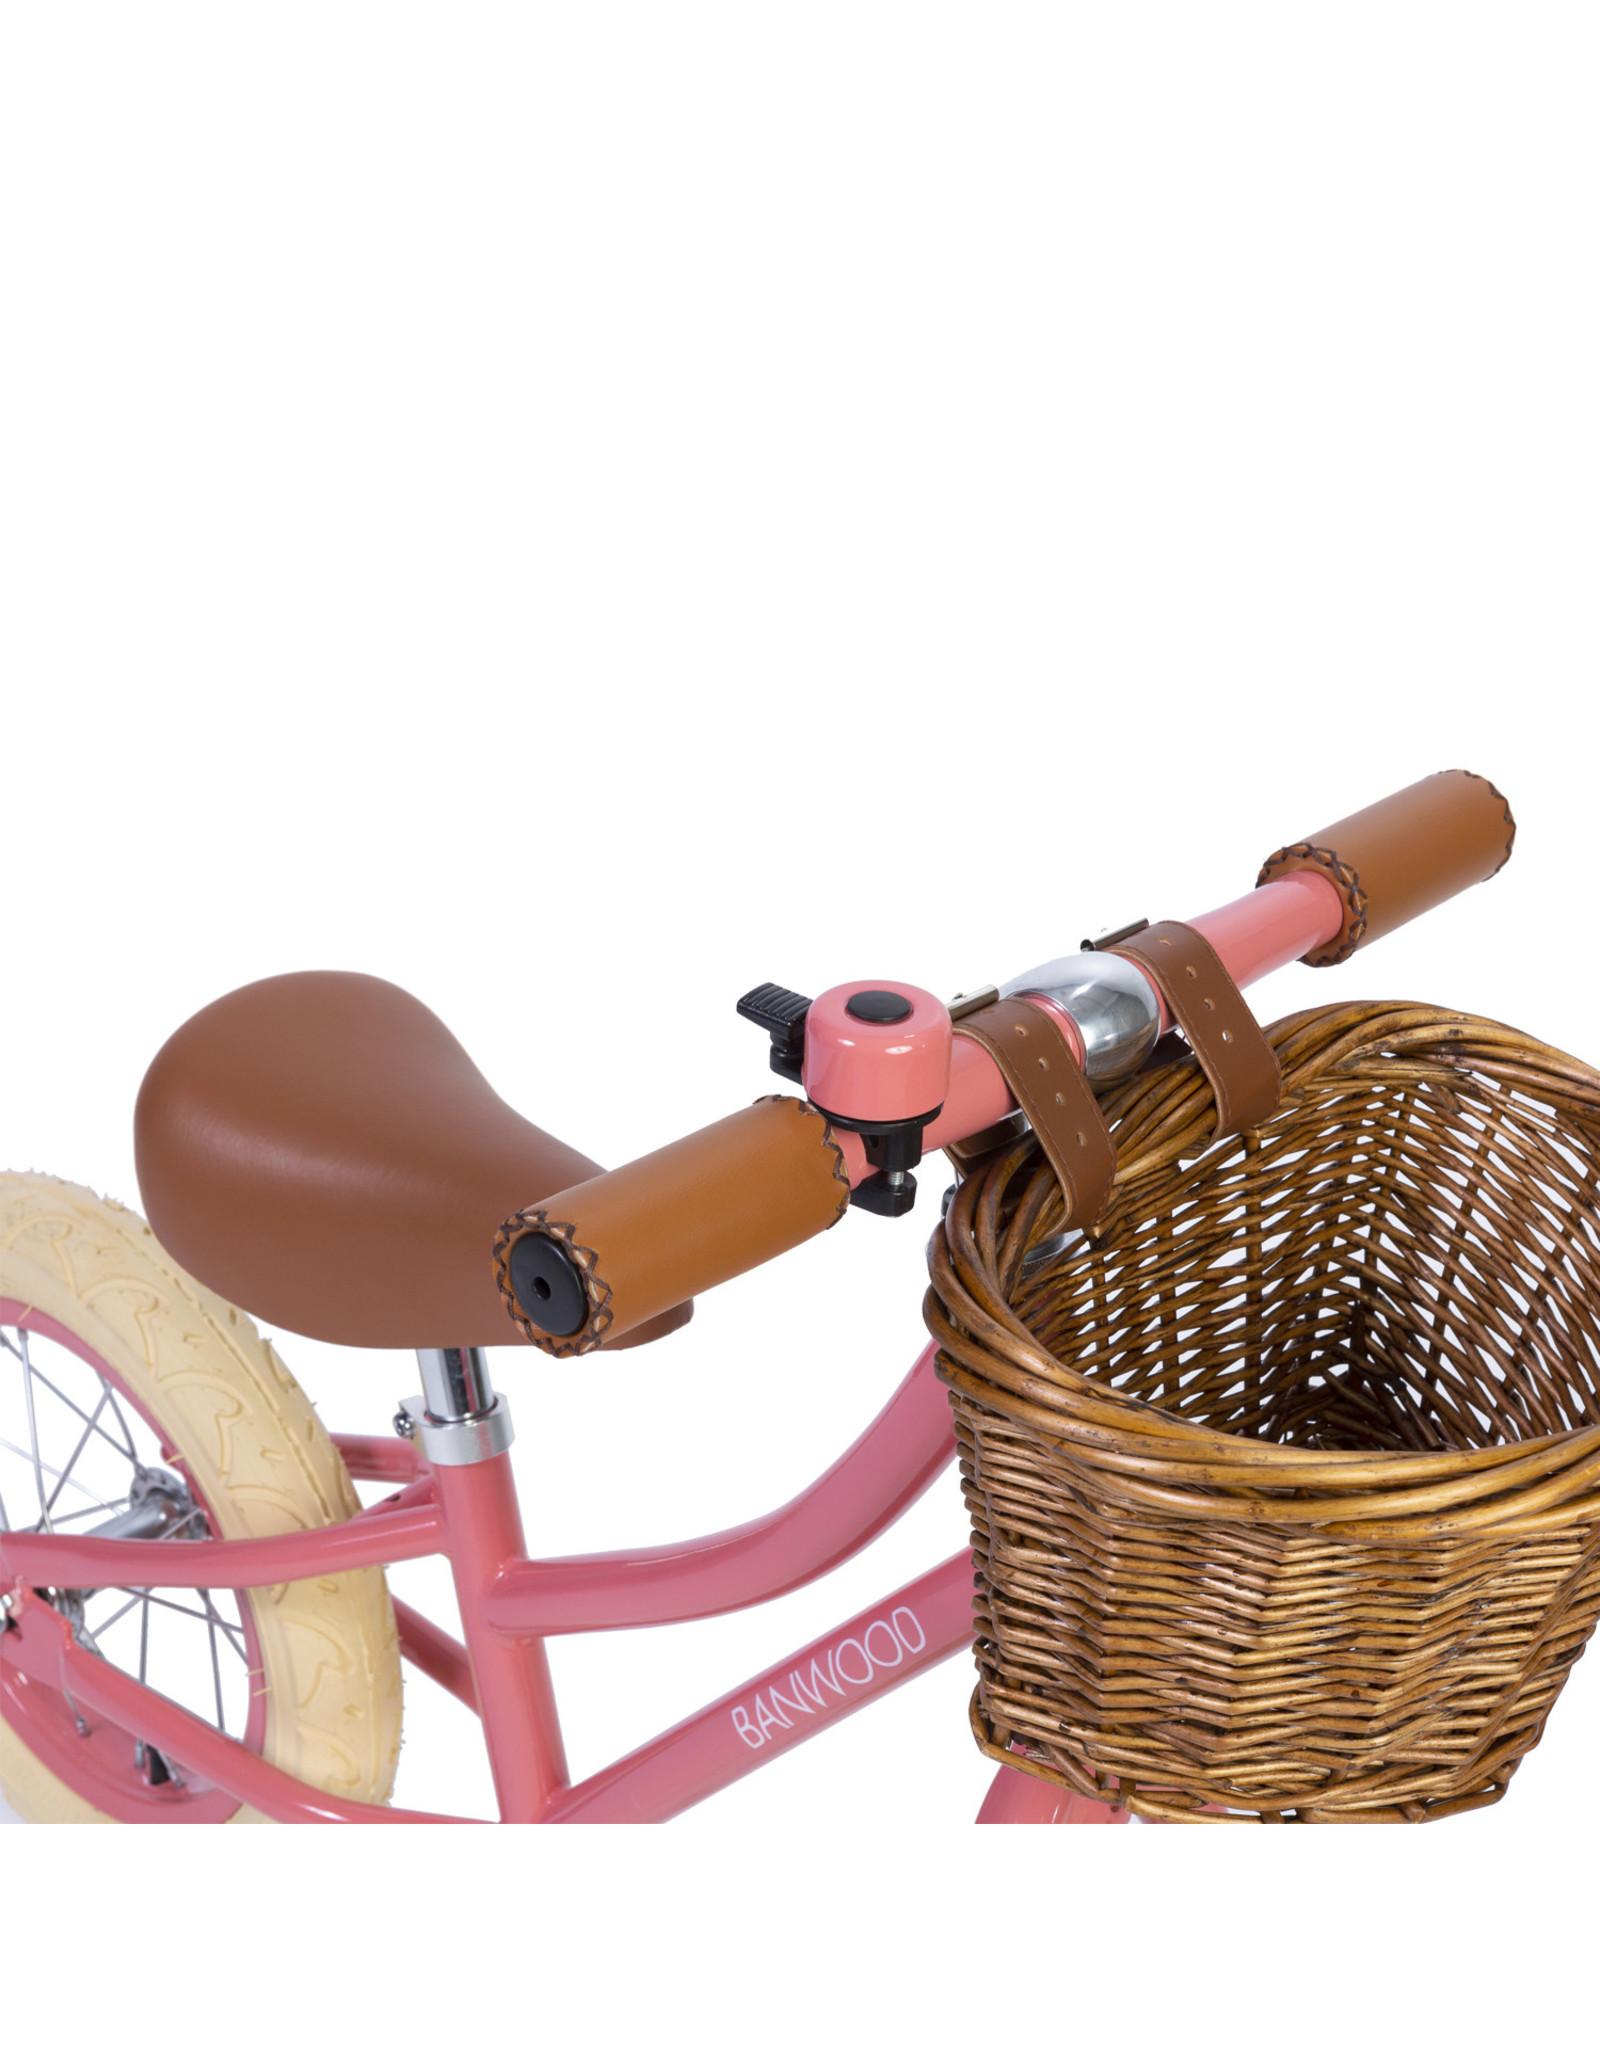 BANWOOD Coral Balance Bike